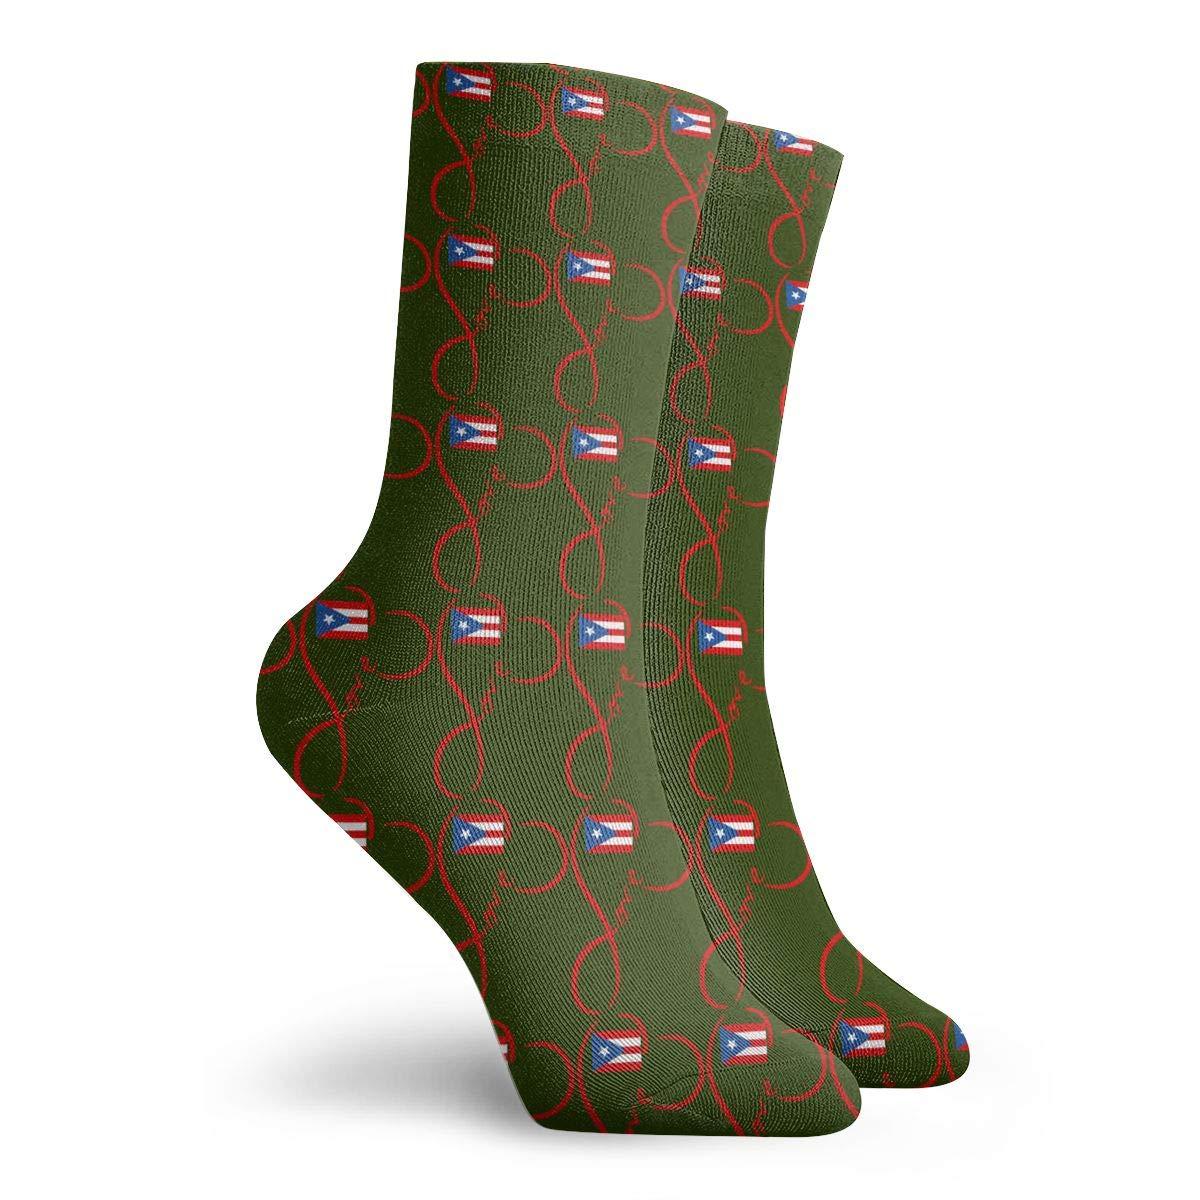 Love Puerto Rico Flag Boricua Puerto Rican Map 3D Socks Unisex Novelty Crew Sock Low Socks Athletic Socks